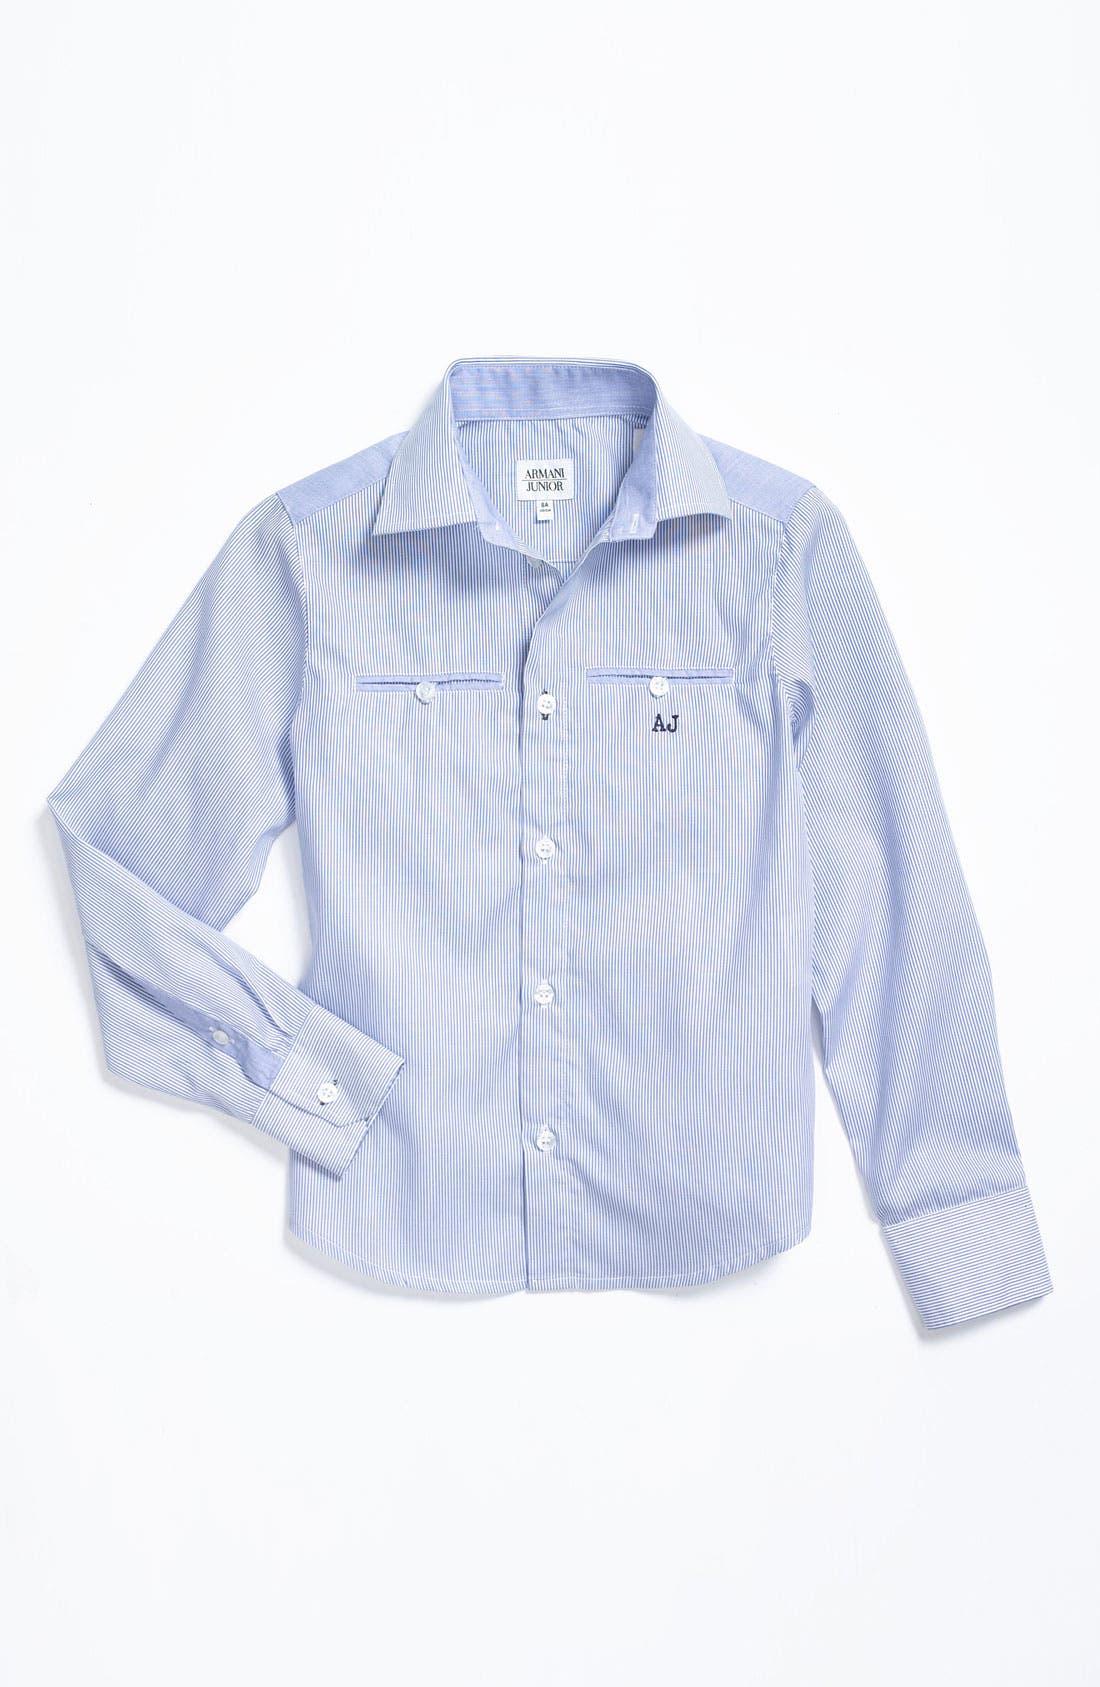 Main Image - Armani Junior Dress Shirt (Big Boys)